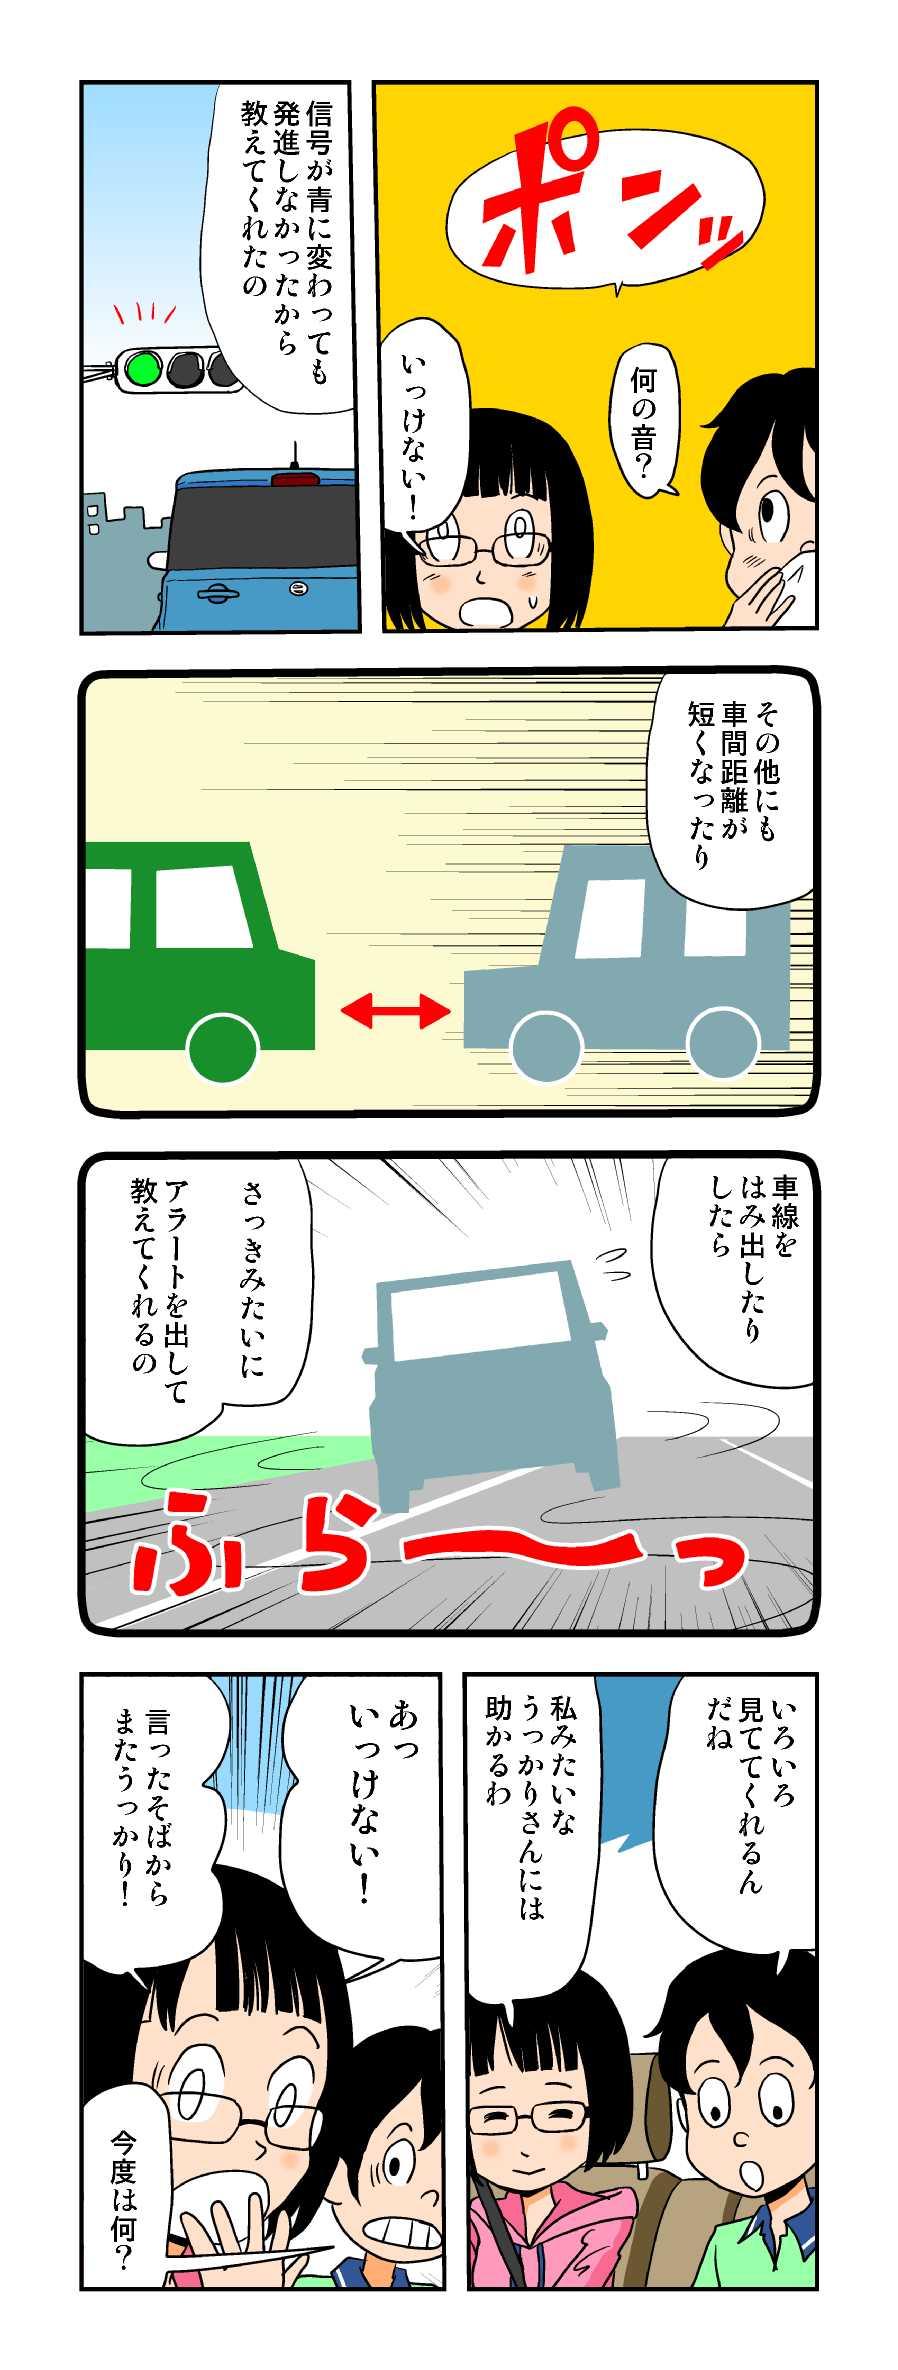 20160930_Y1_01 (3)